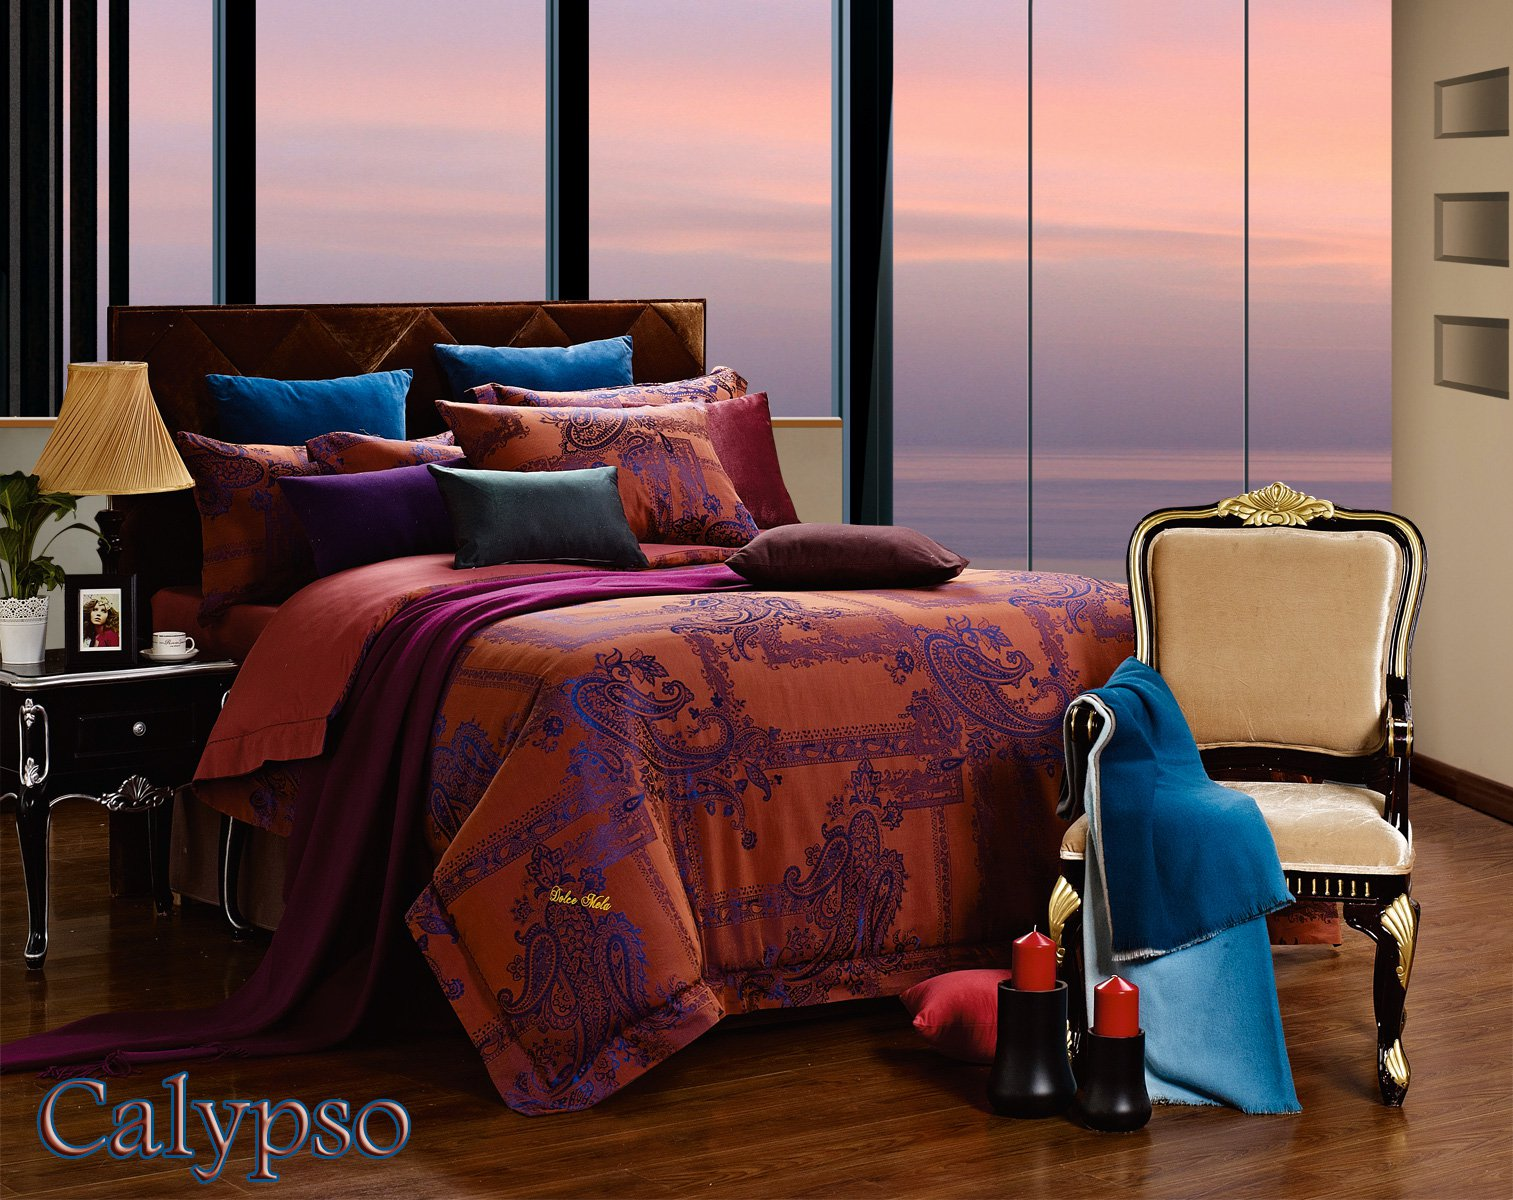 Calypso by Dolce Mela 6PC Queen Size Duvet Cover Set